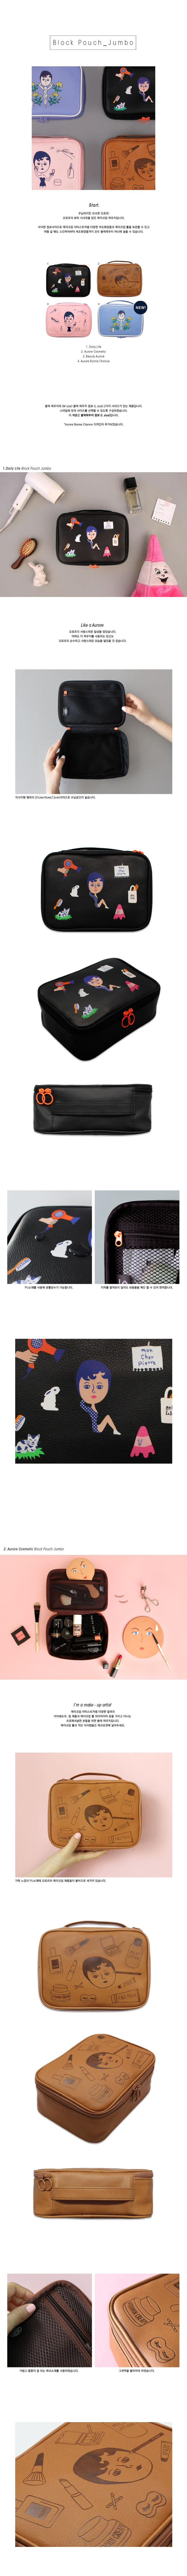 BLOCK POUCH JUMBO 4종 - 1537, 23,000원, 화장품파우치, 애나멜/인조가죽